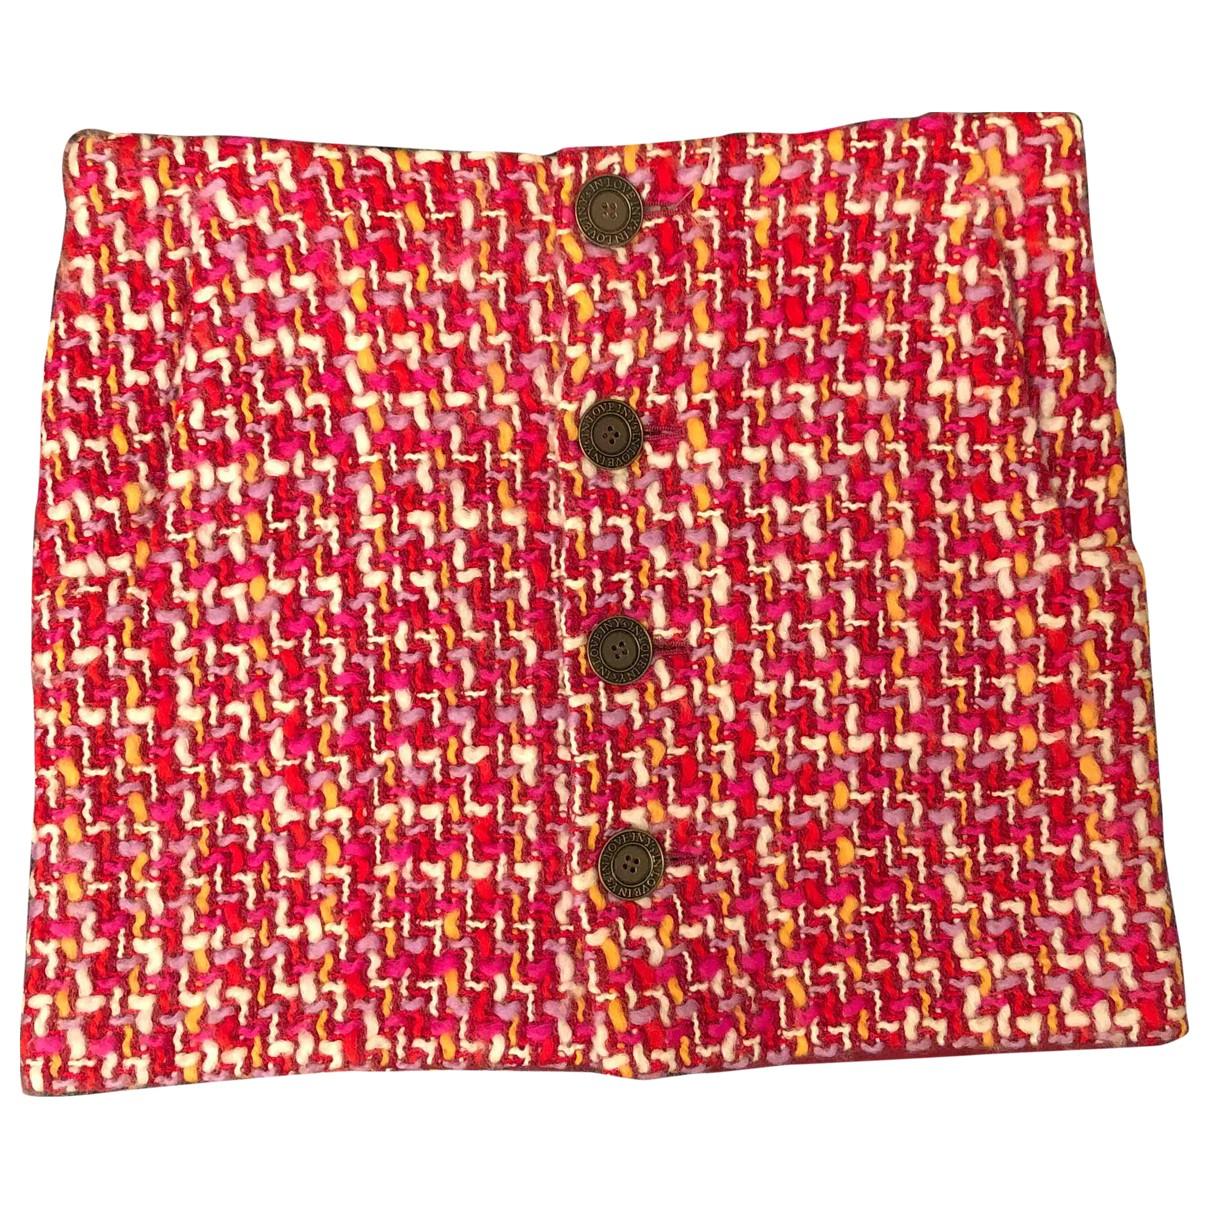 Yohji Yamamoto - Jupe   pour femme en laine - multicolore